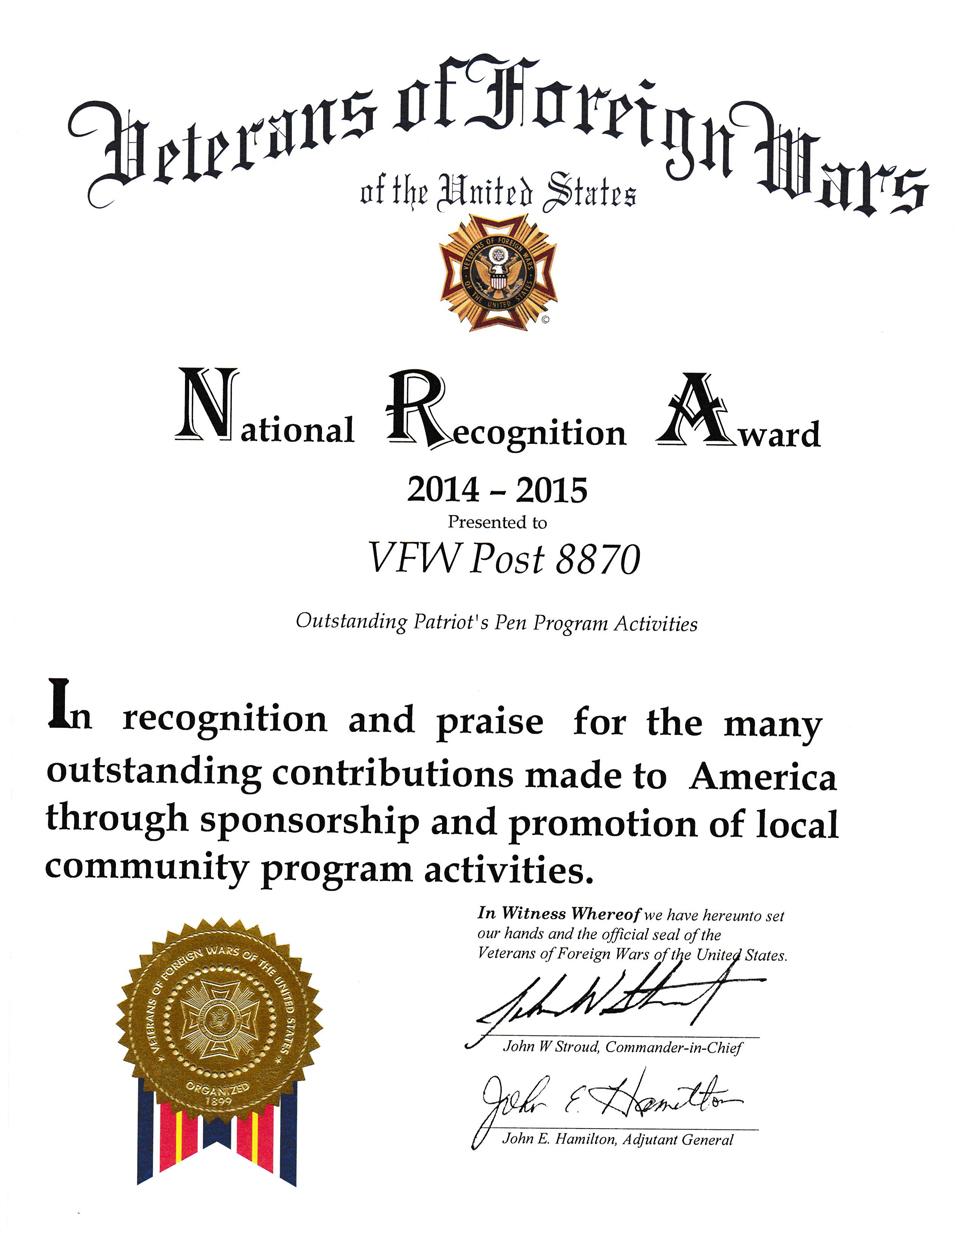 National Recognition Award - Patriots Pen